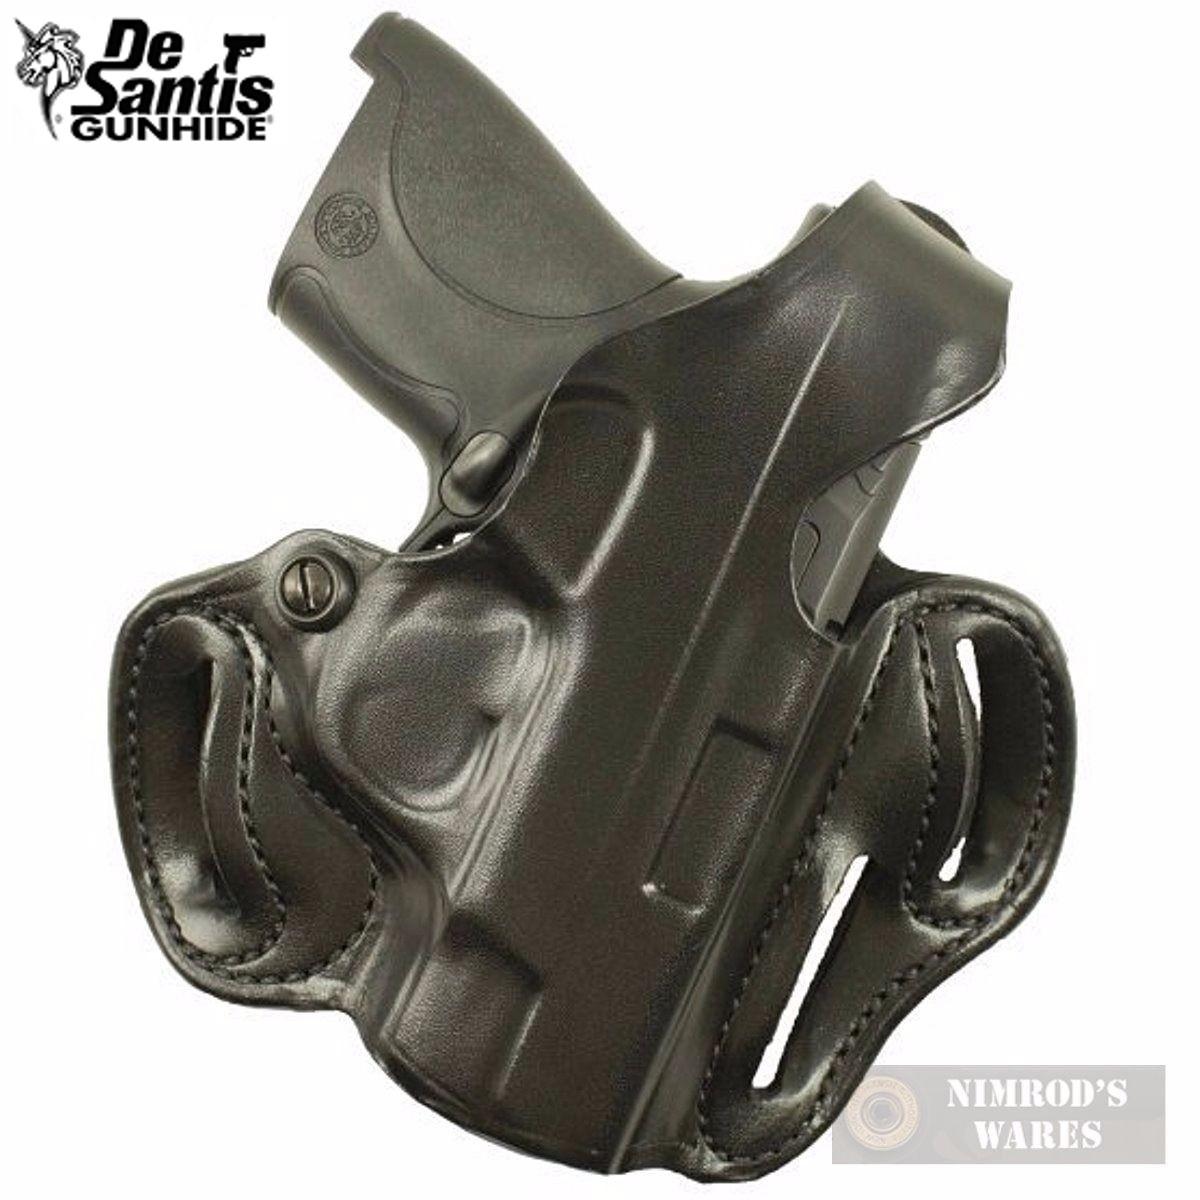 DeSantis S&W SHIELD Thumb Break Scabbard HOLSTER RH Black 001BAX7Z0